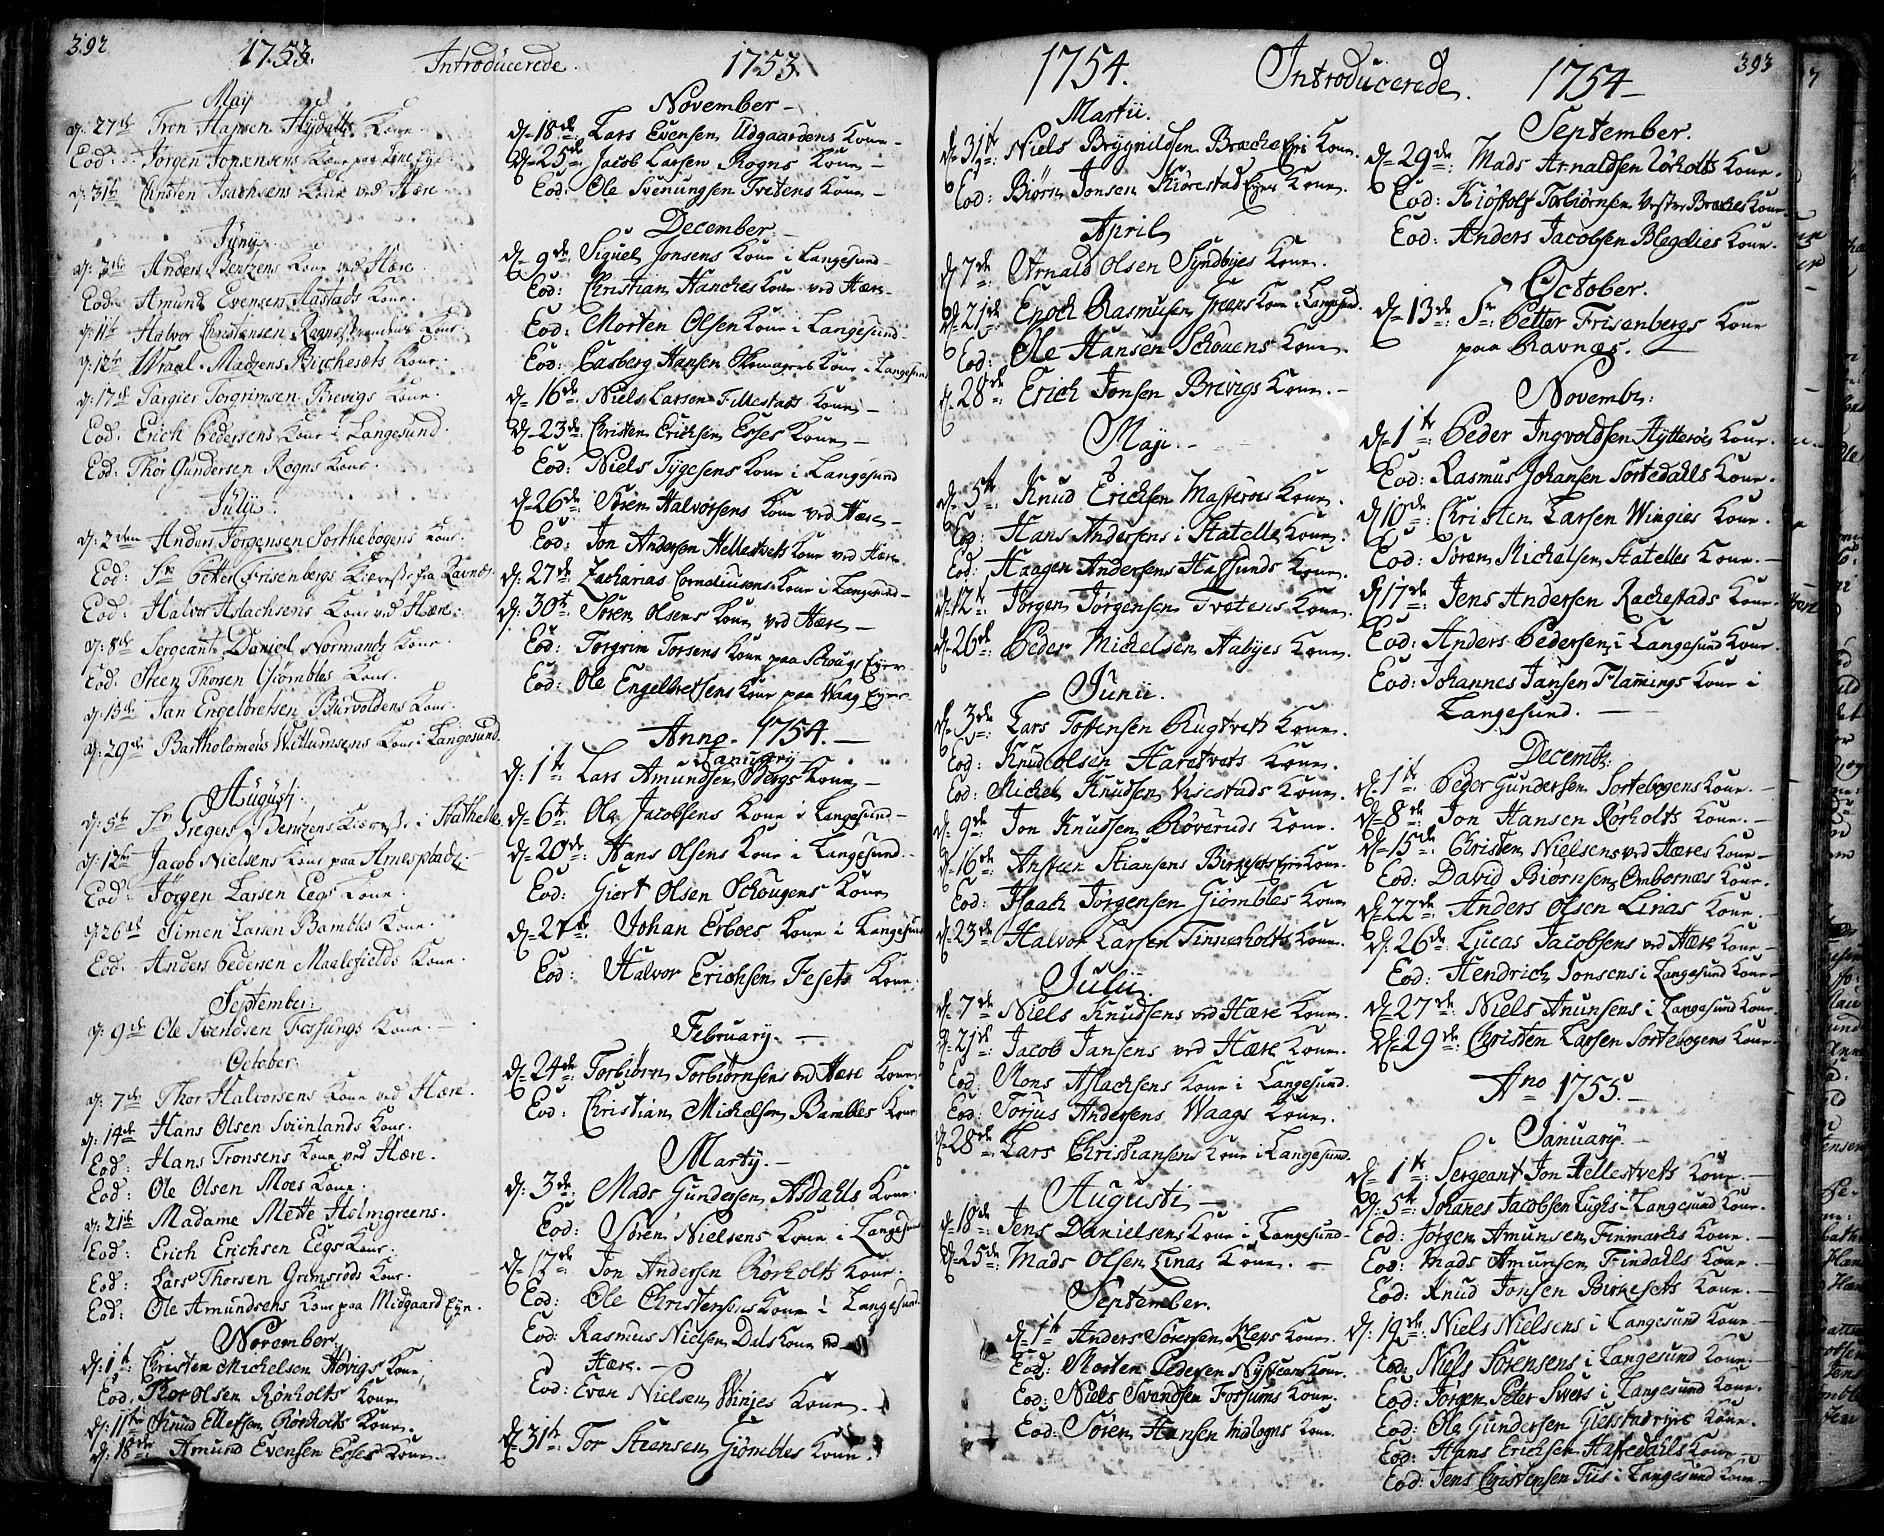 SAKO, Bamble kirkebøker, F/Fa/L0001: Ministerialbok nr. I 1, 1702-1774, s. 392-393